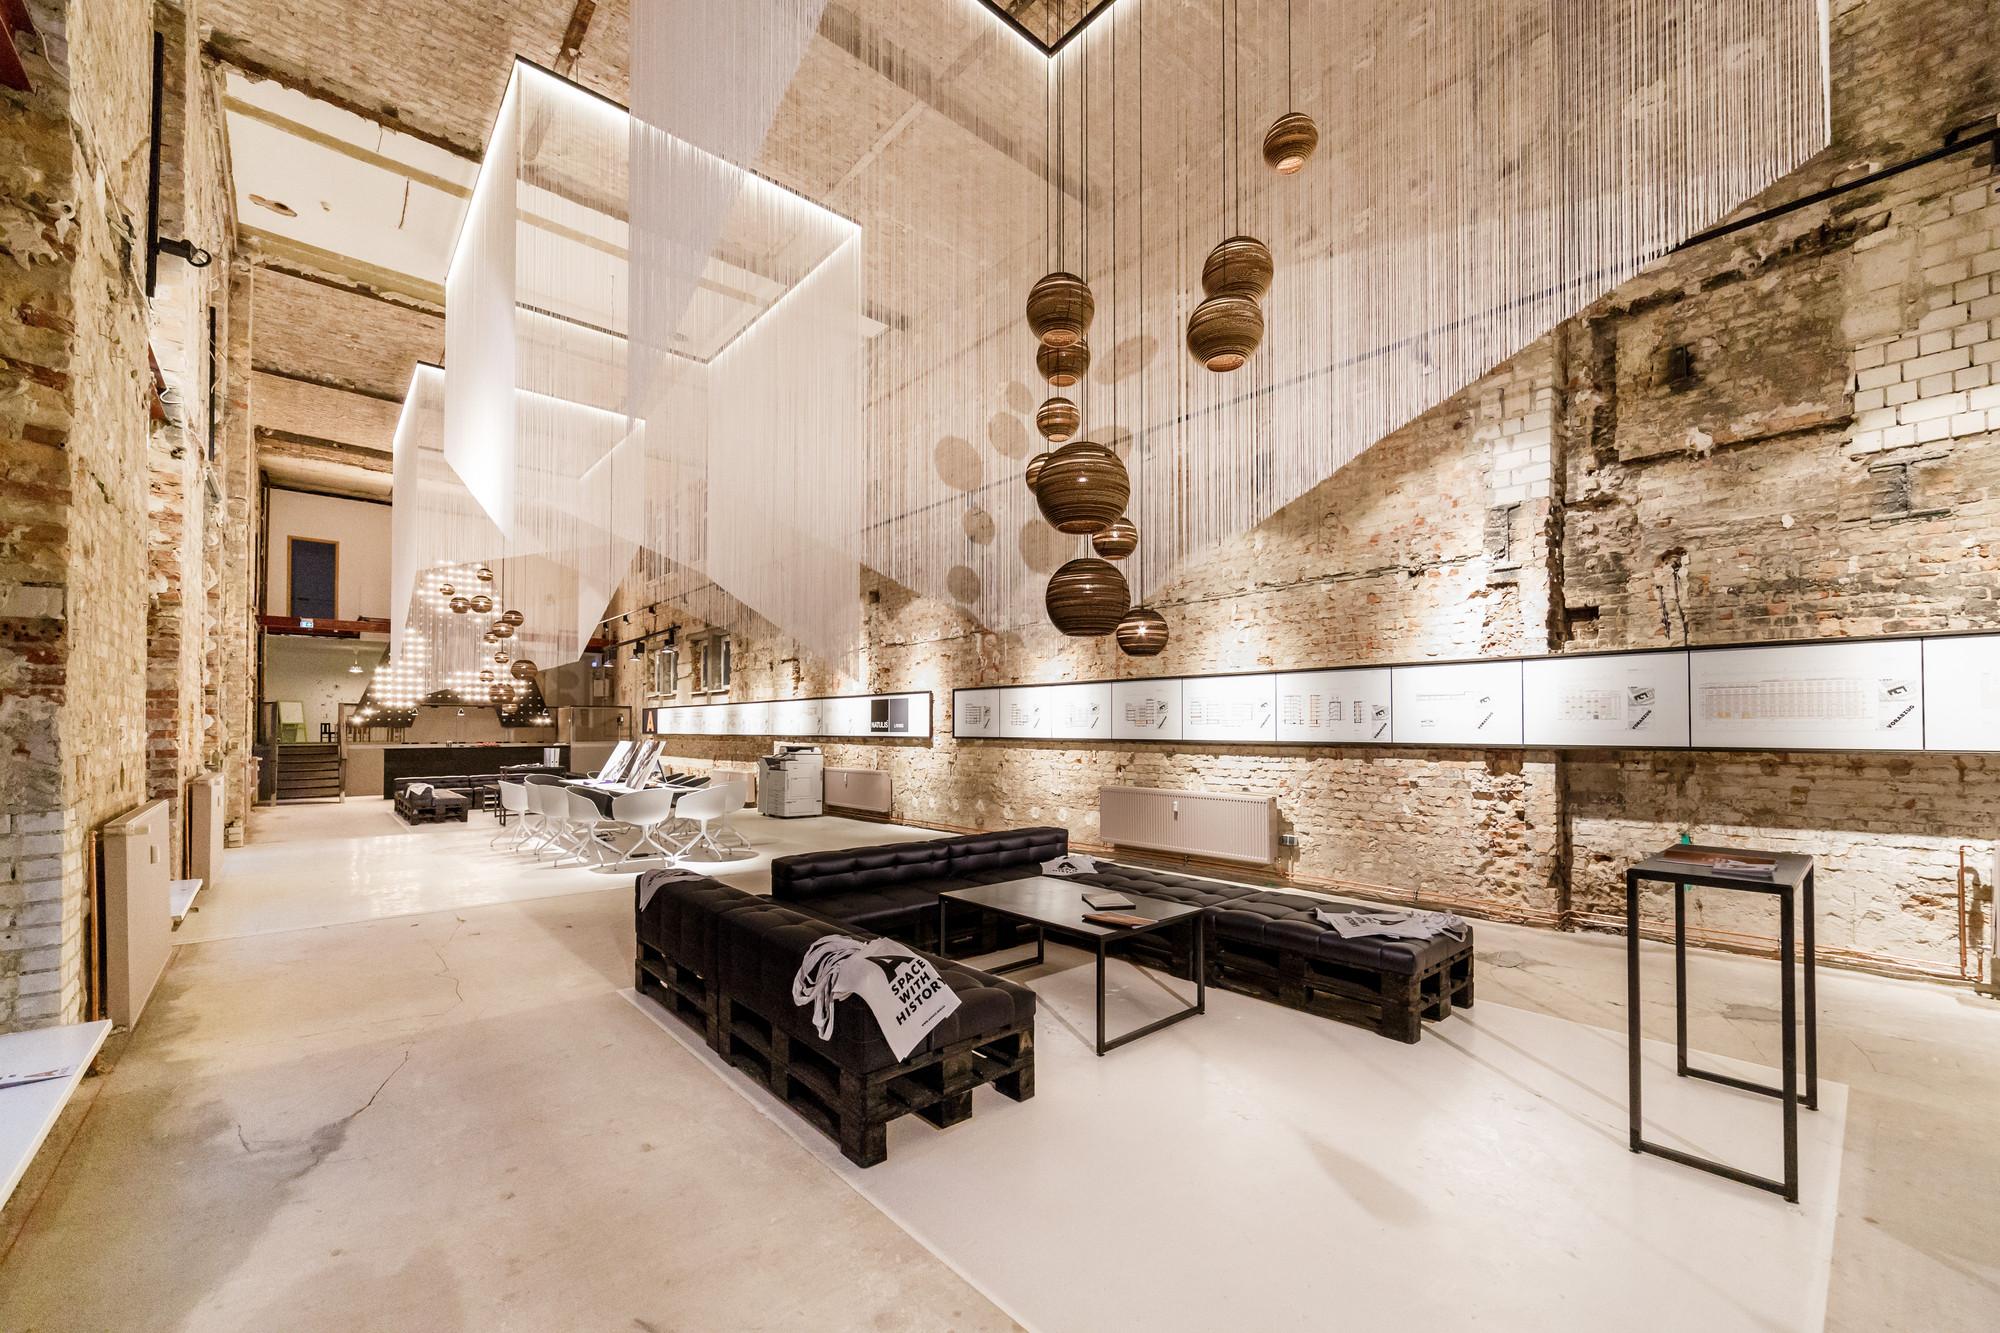 Gallery of A space: Lofts in Berlin Mitte / plajer & franz